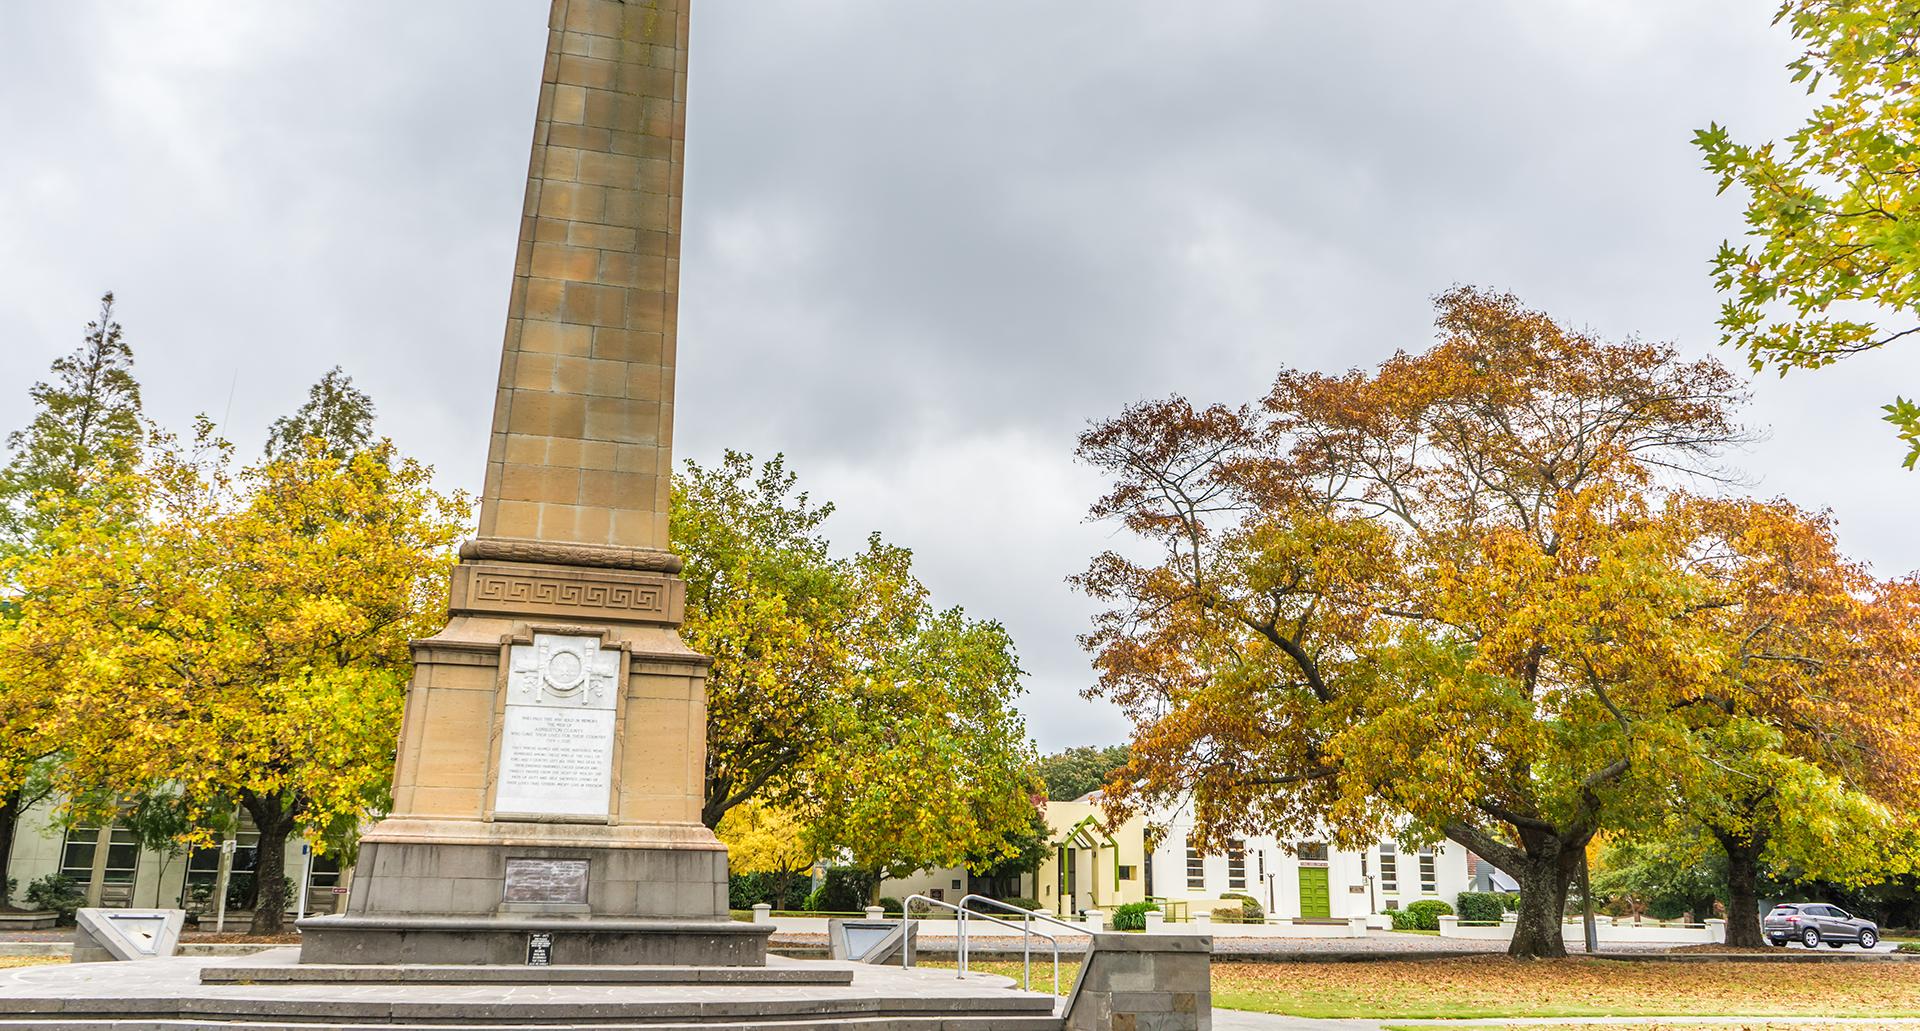 Ashburton Memorial